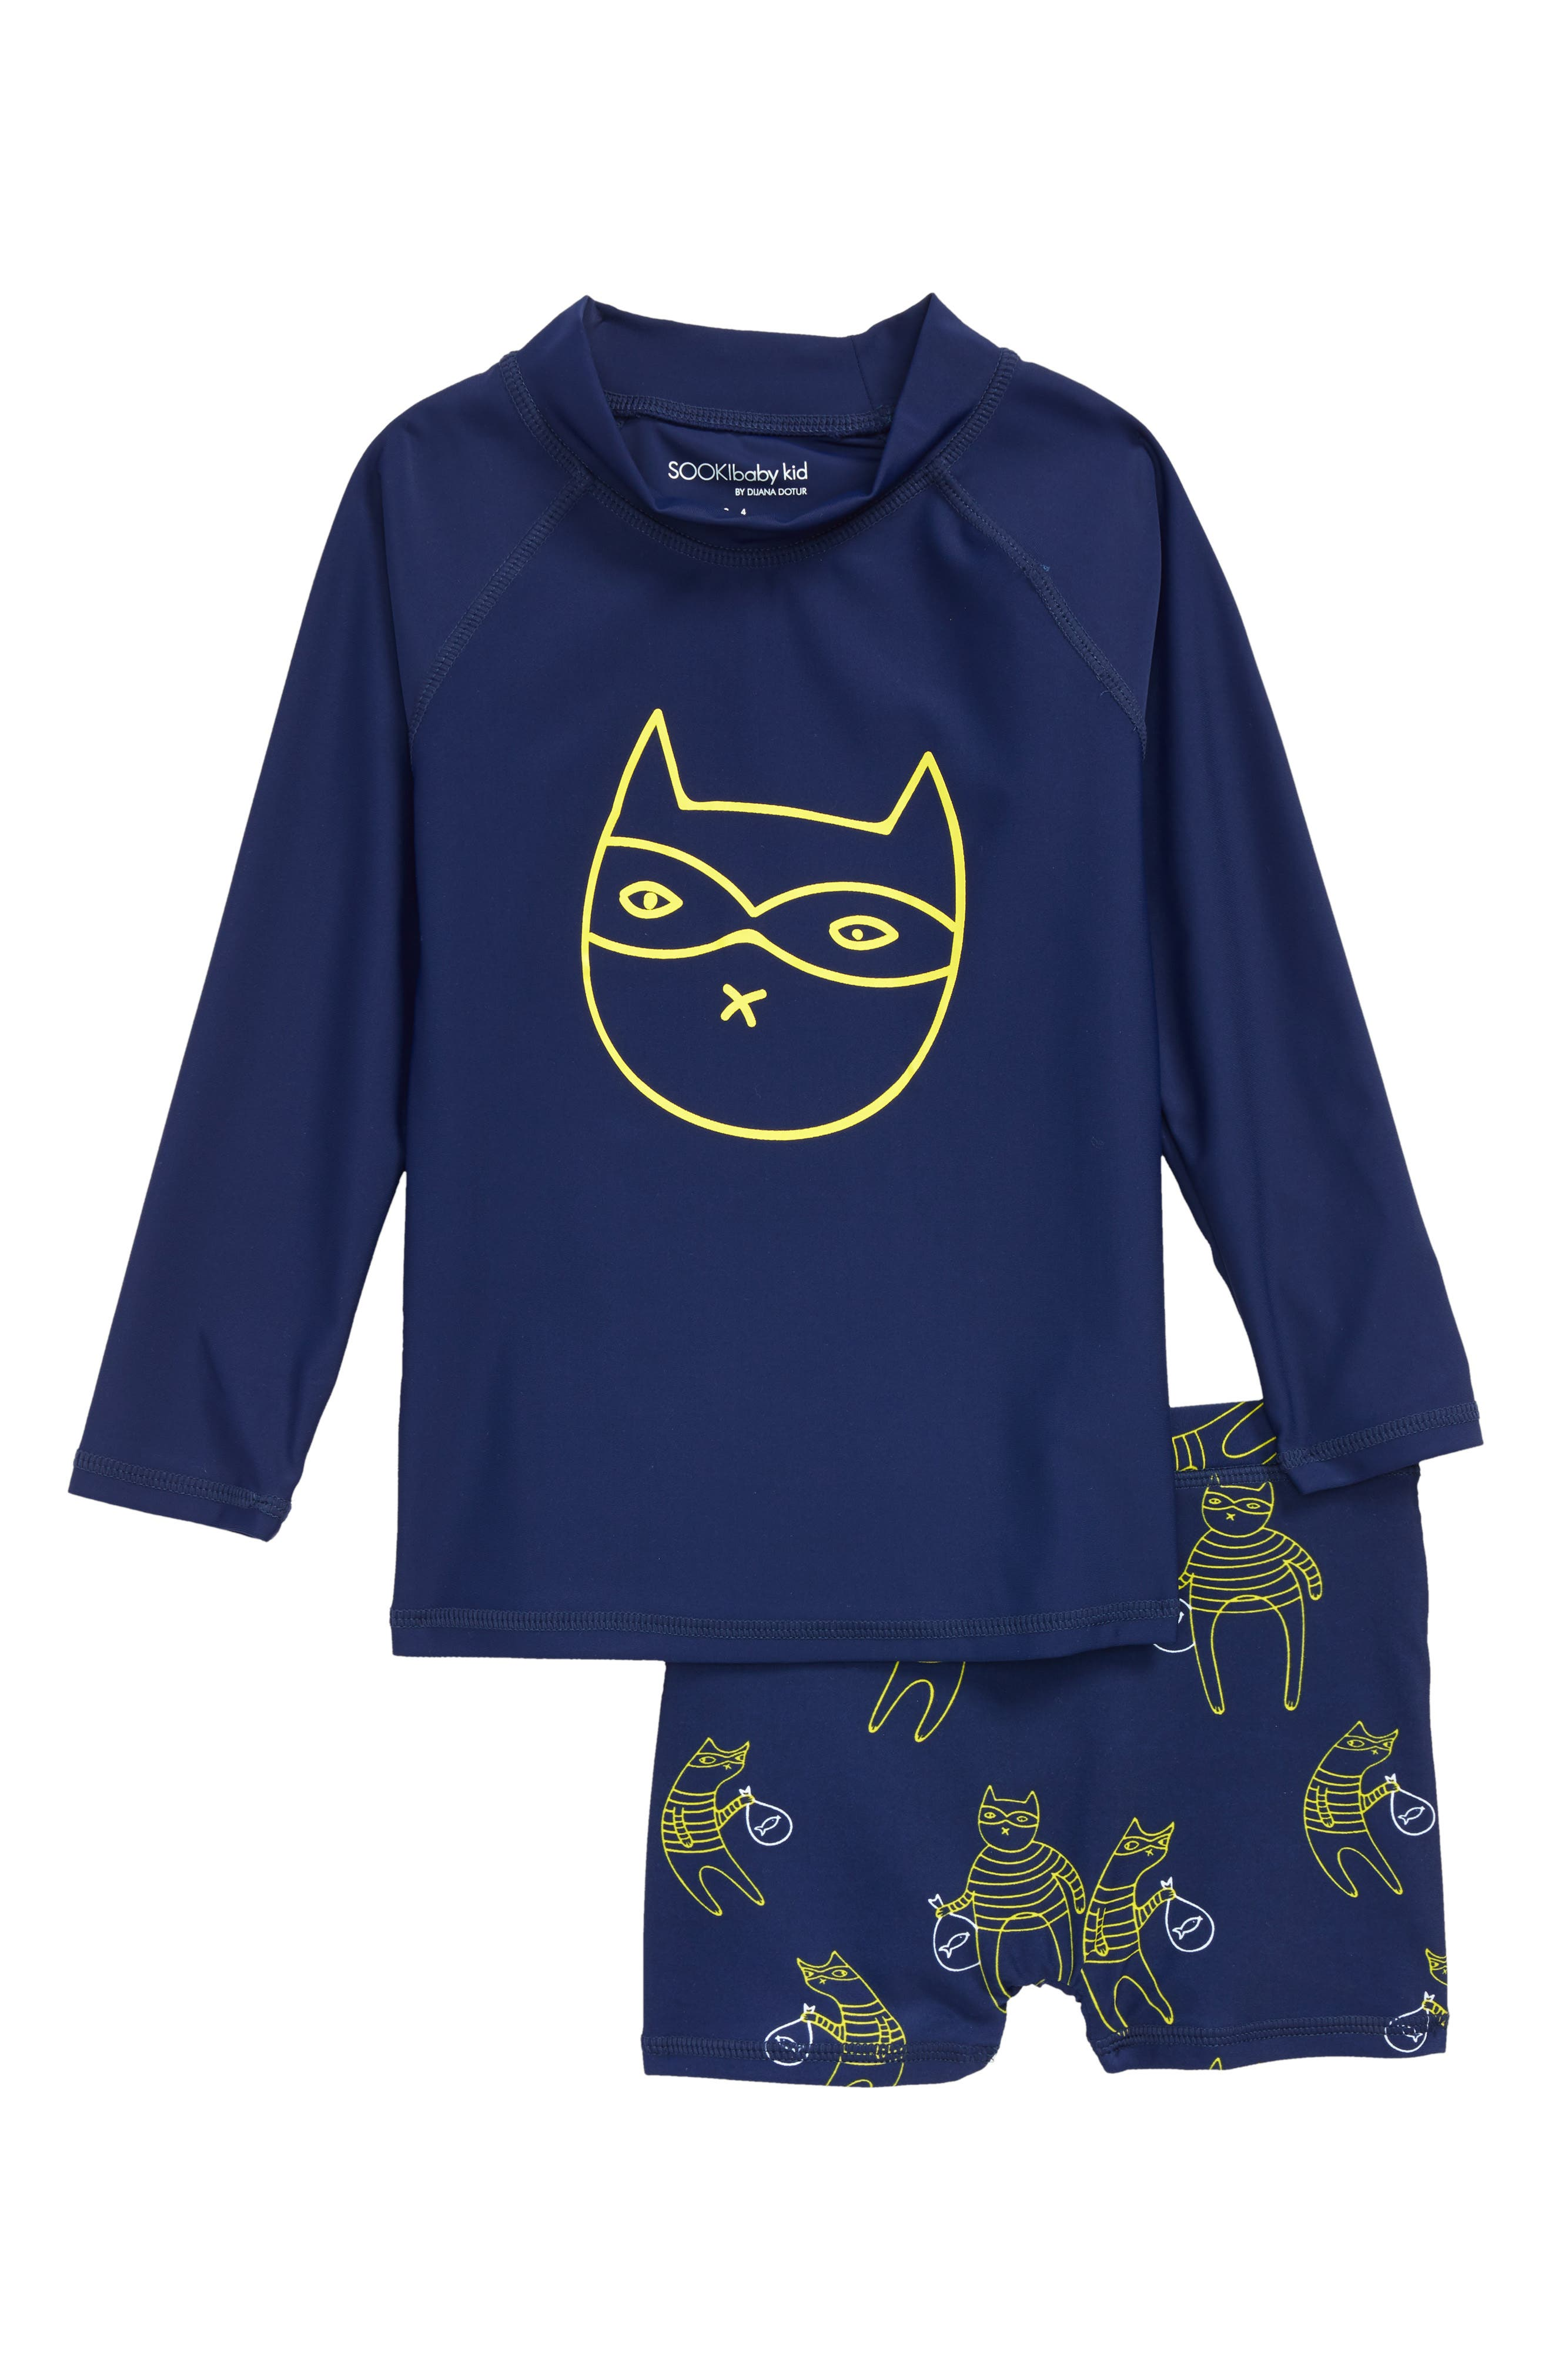 Alternate Image 1 Selected - SOOKIbaby Cat Bandit Two-Piece Rashgaurd Swimsuit (Baby Boys & Toddler Boys)